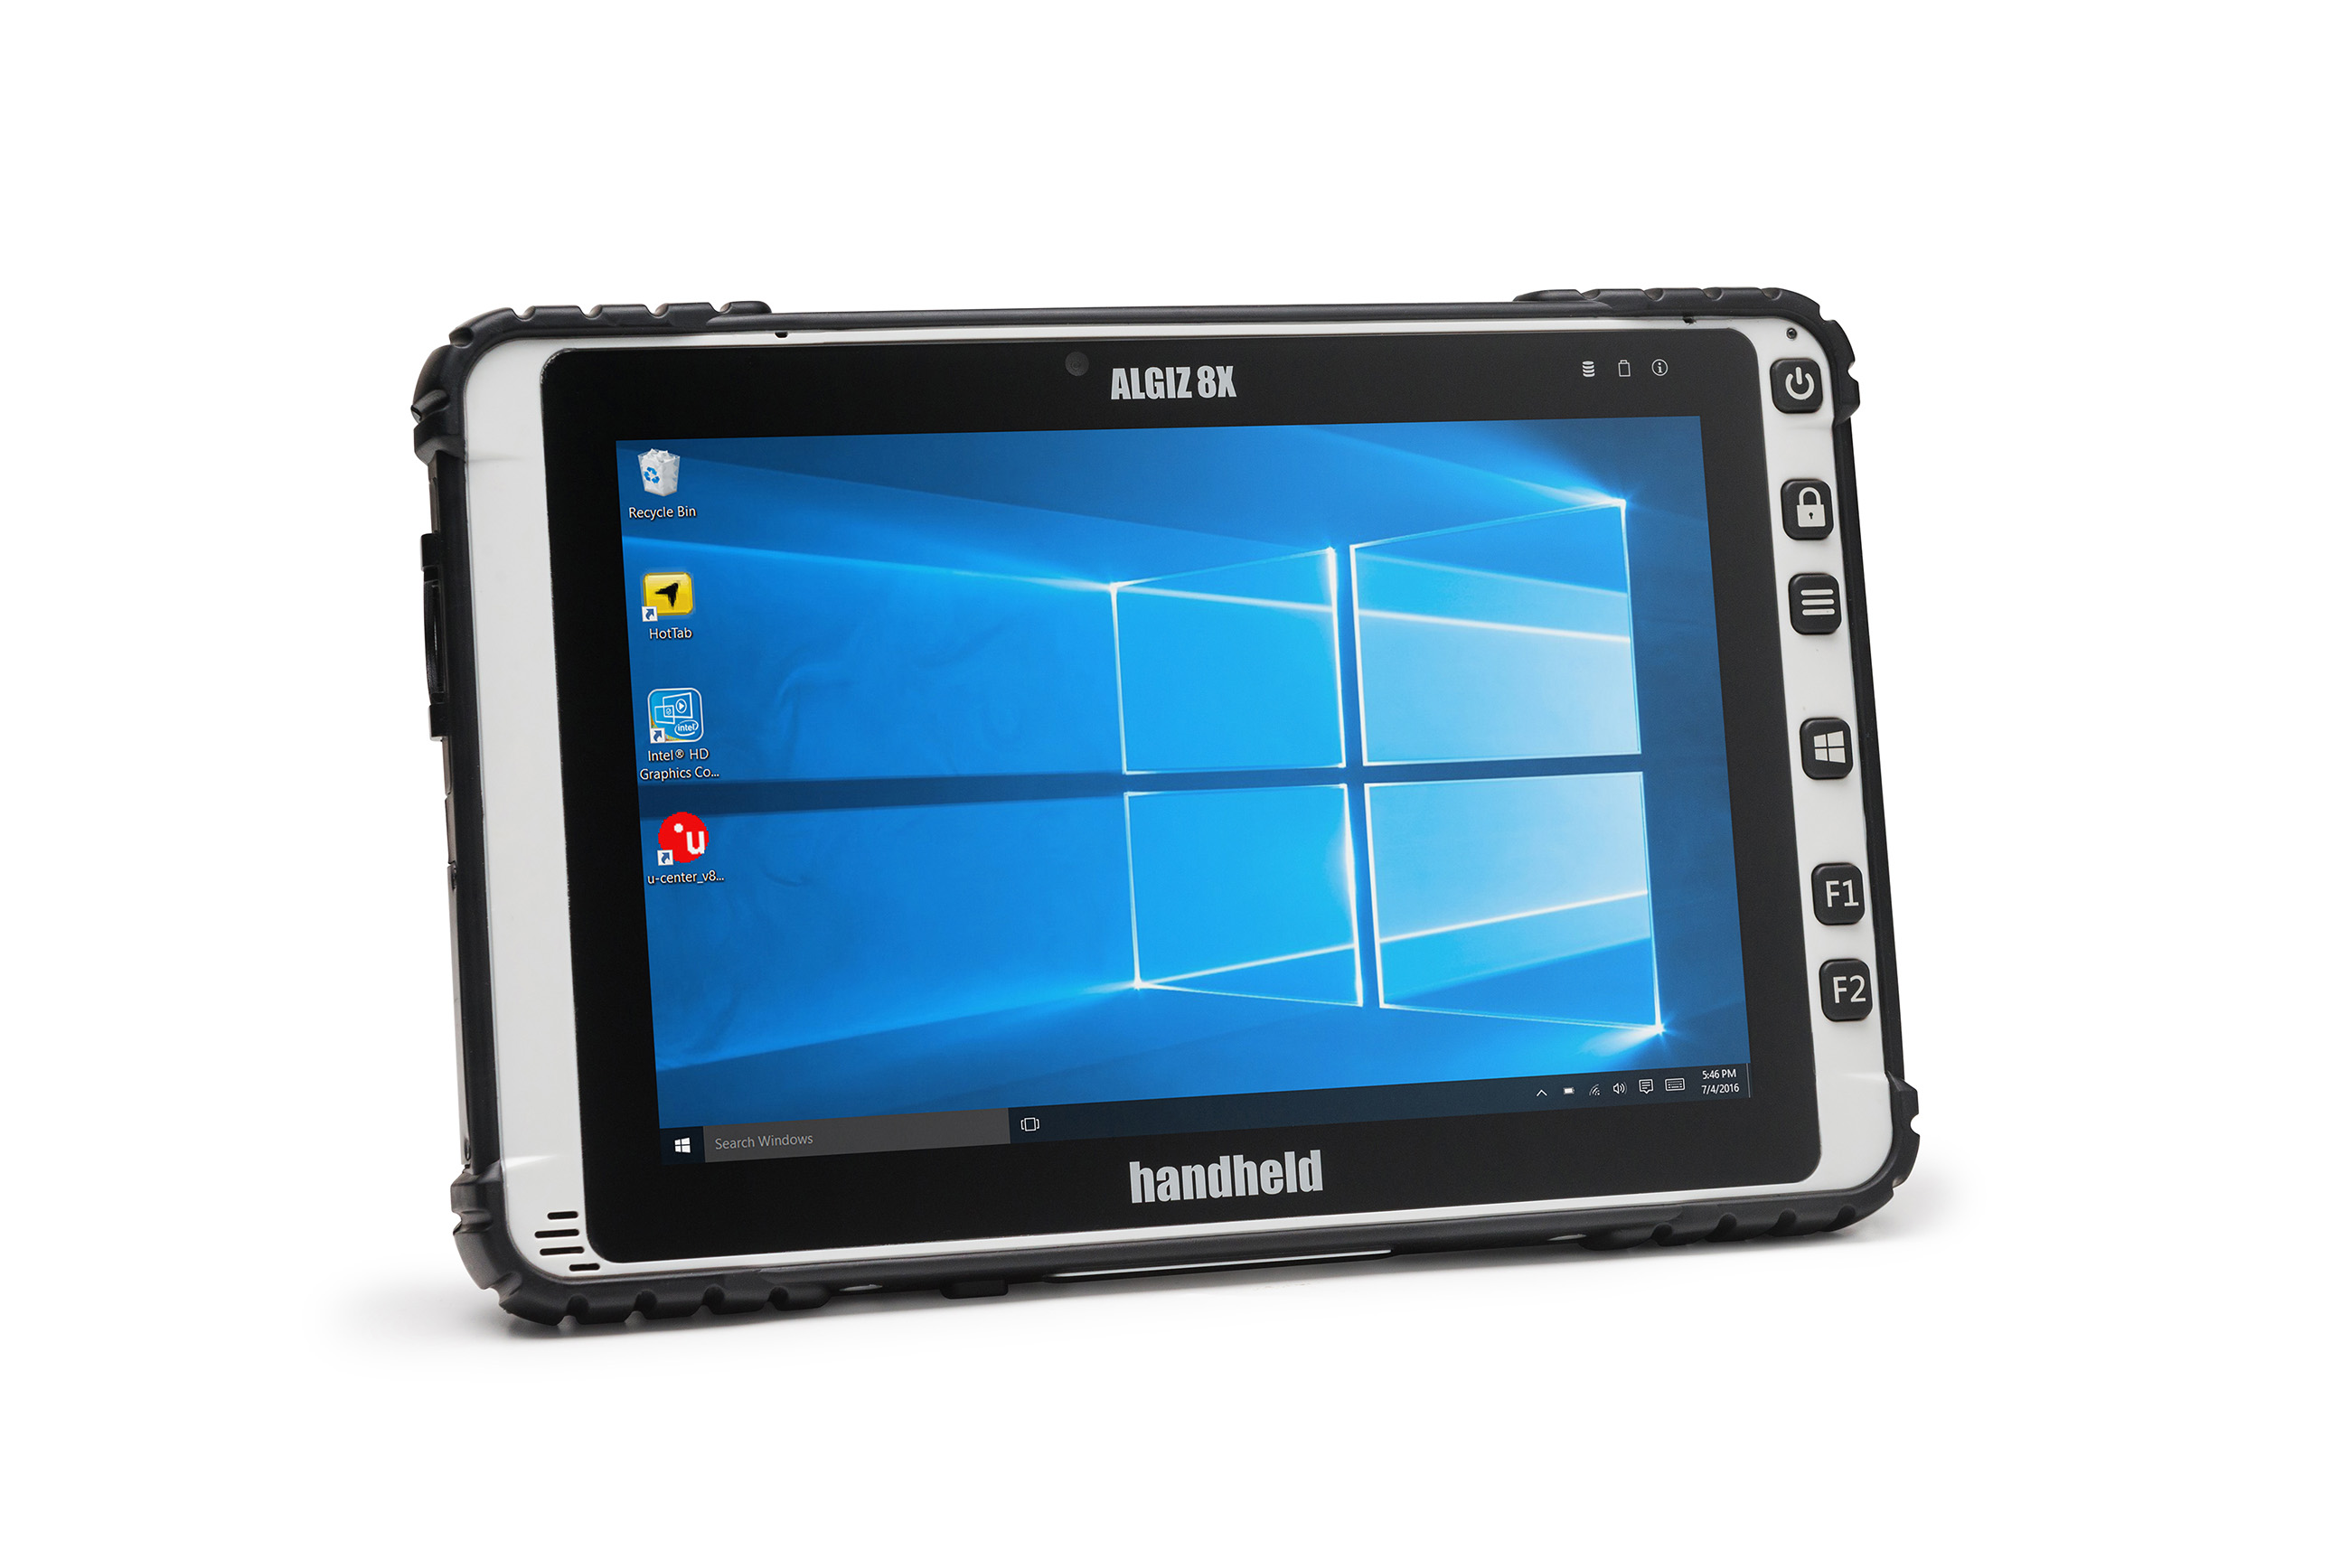 Introducing The Algiz 8x Rugged Tablet A New Tough Computer